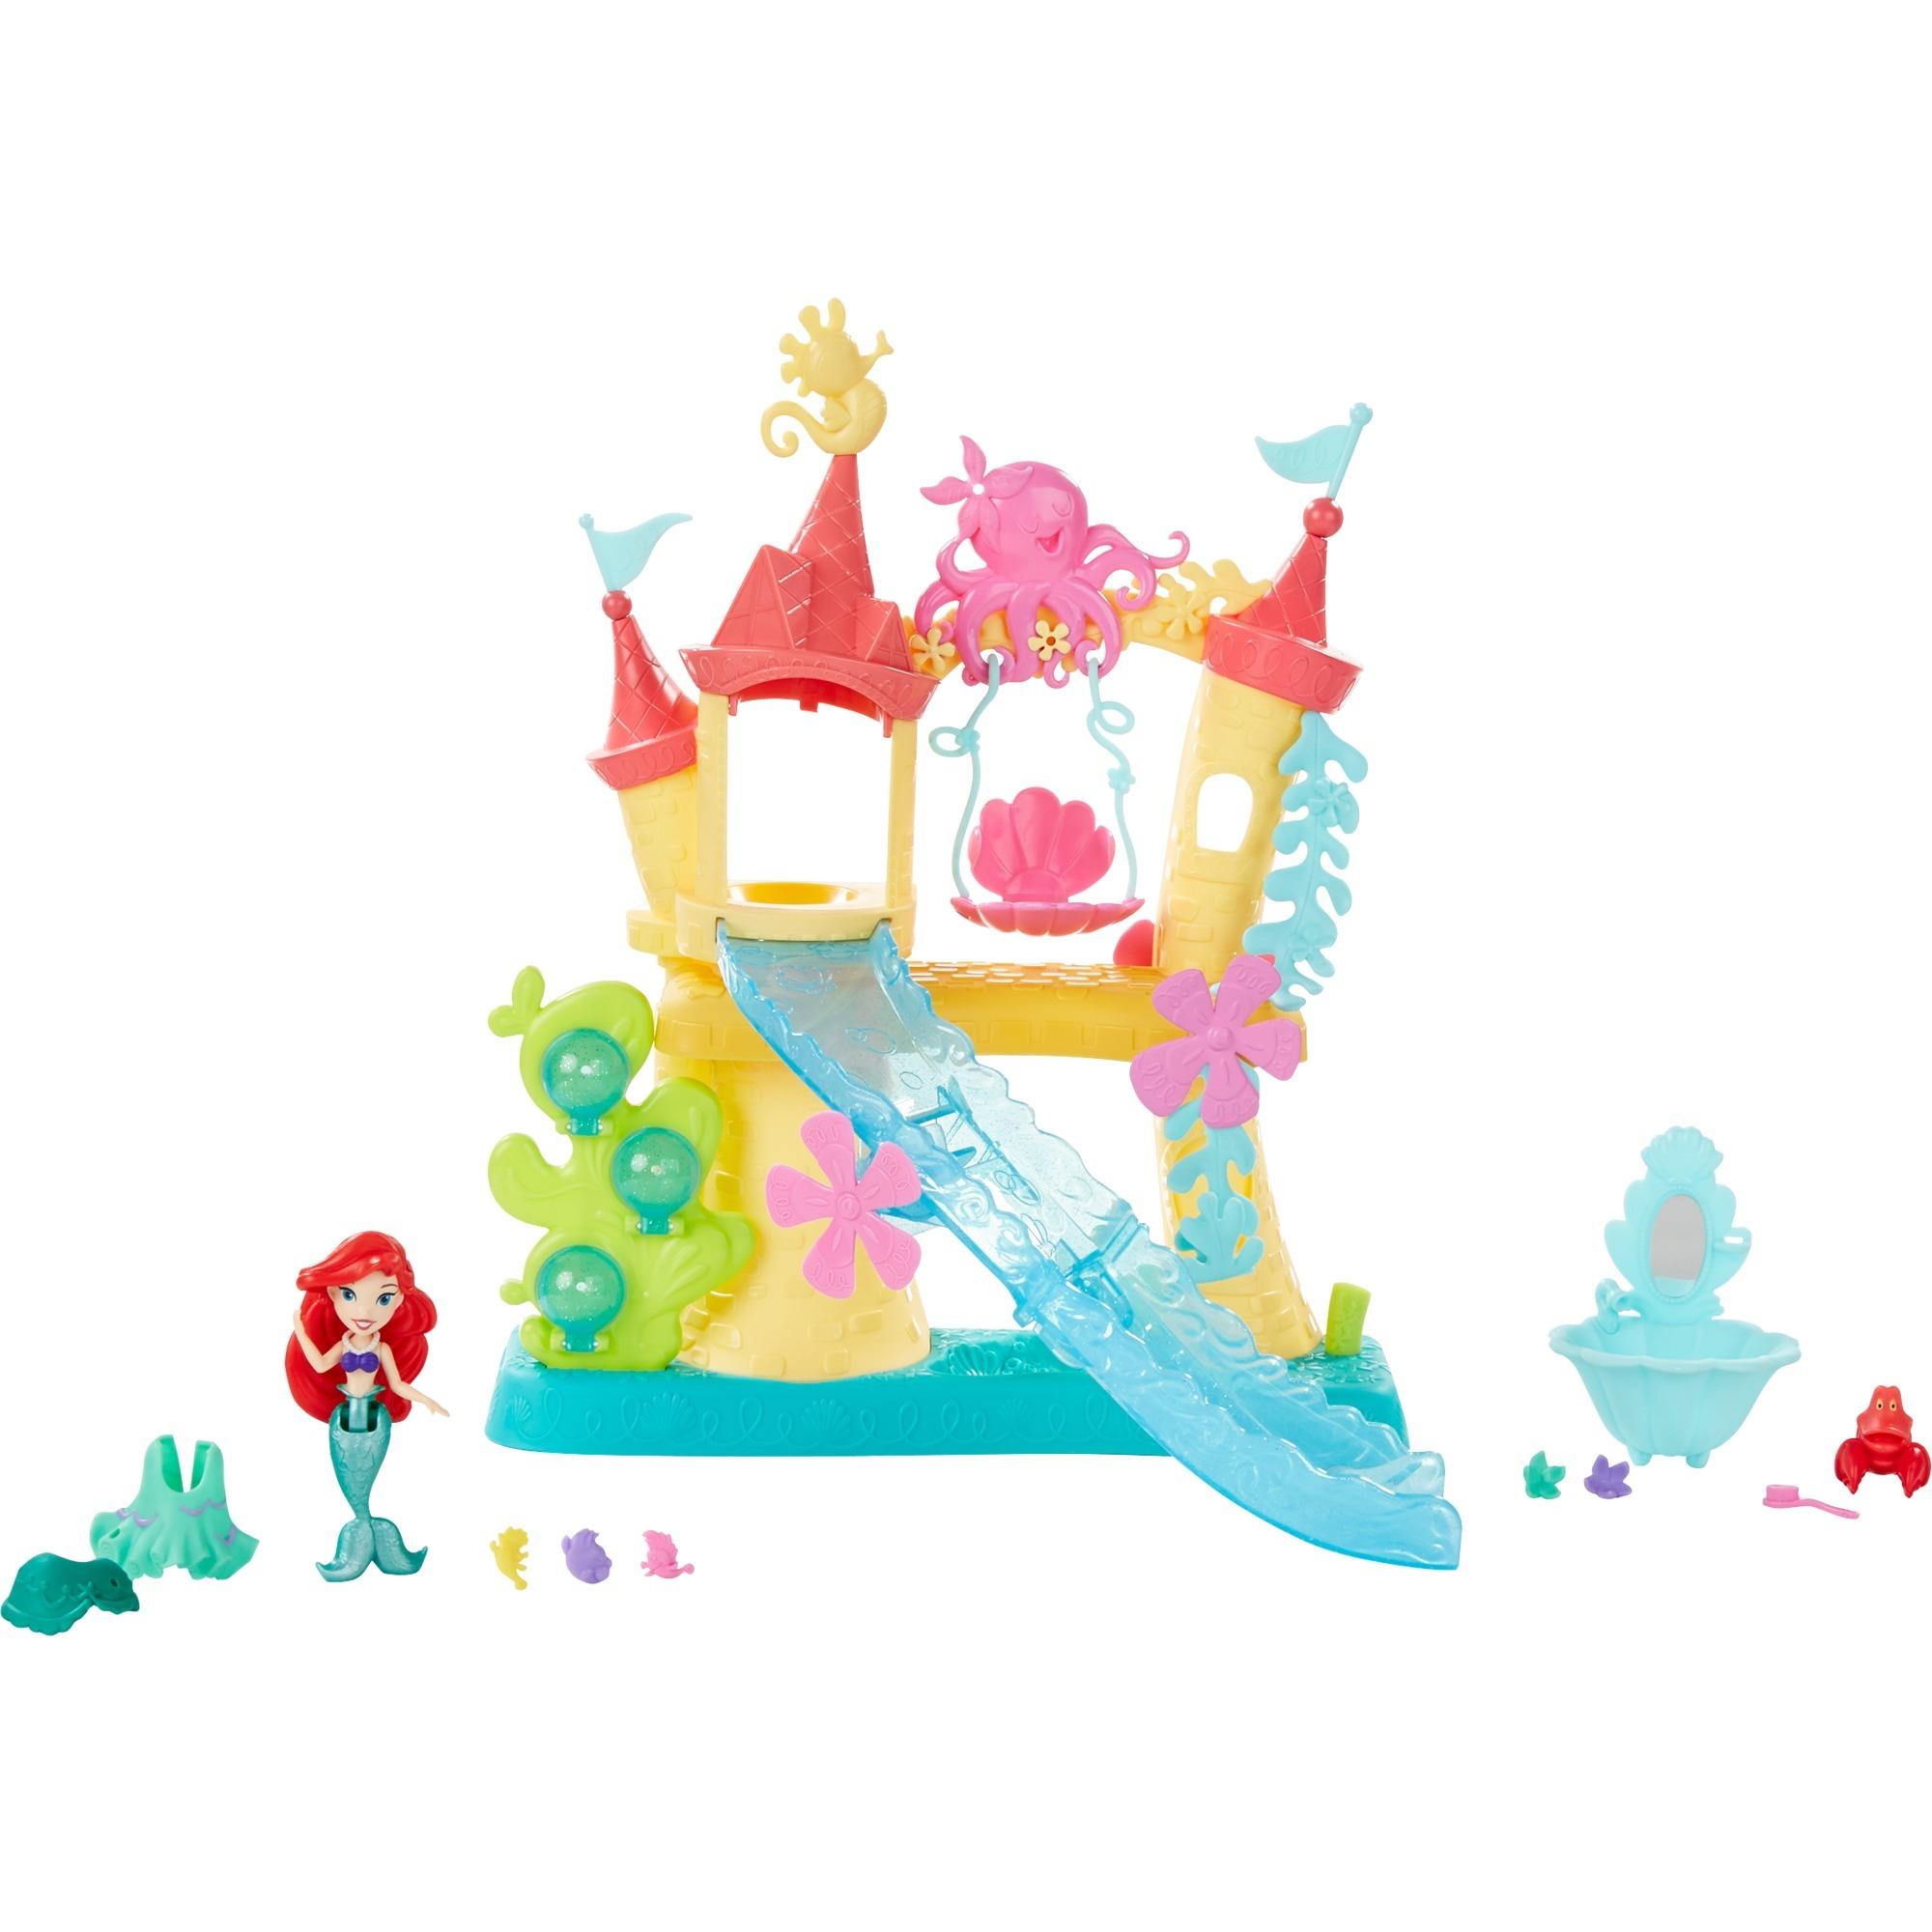 b5836-dukkehus-spil-figur